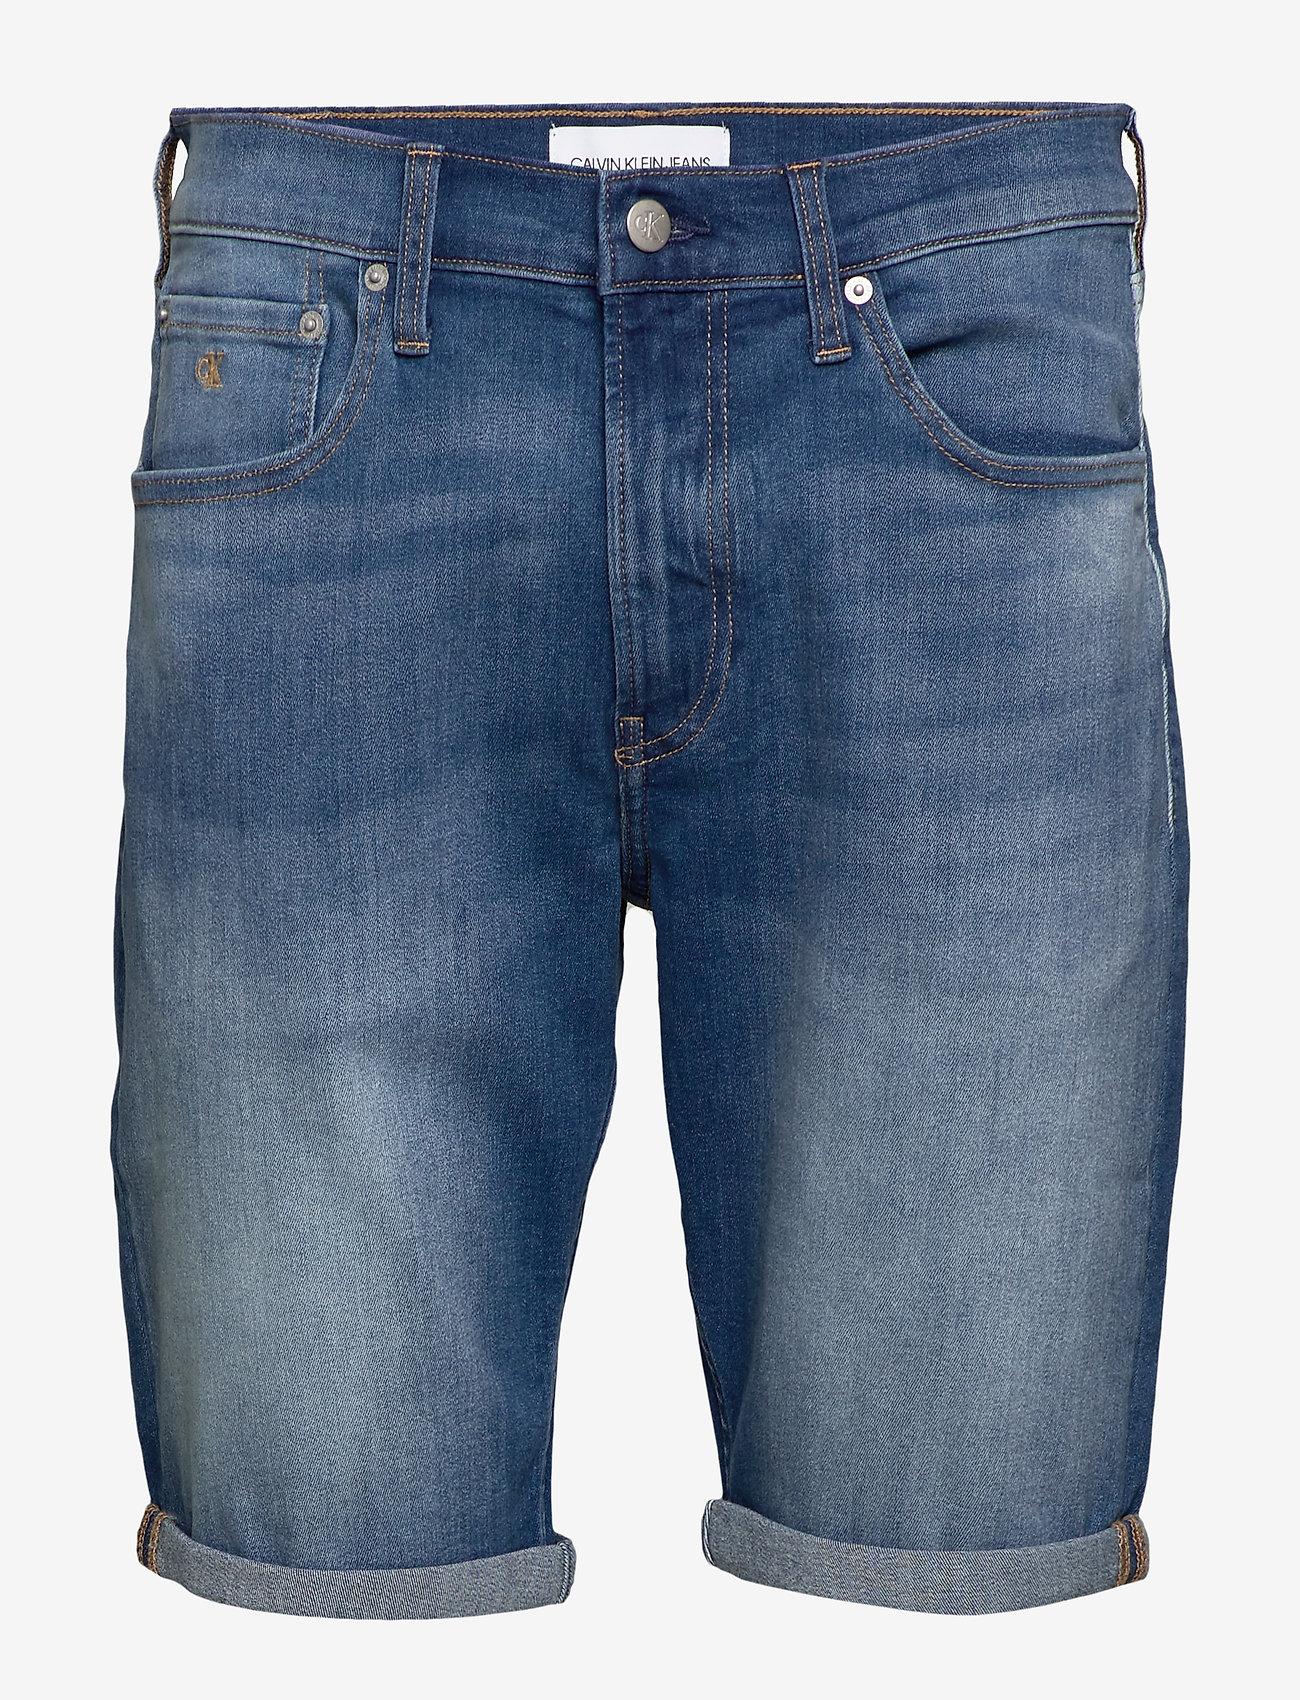 Calvin Klein Jeans - REGULAR SHORT - farkkushortsit - da033 bright mid - 0